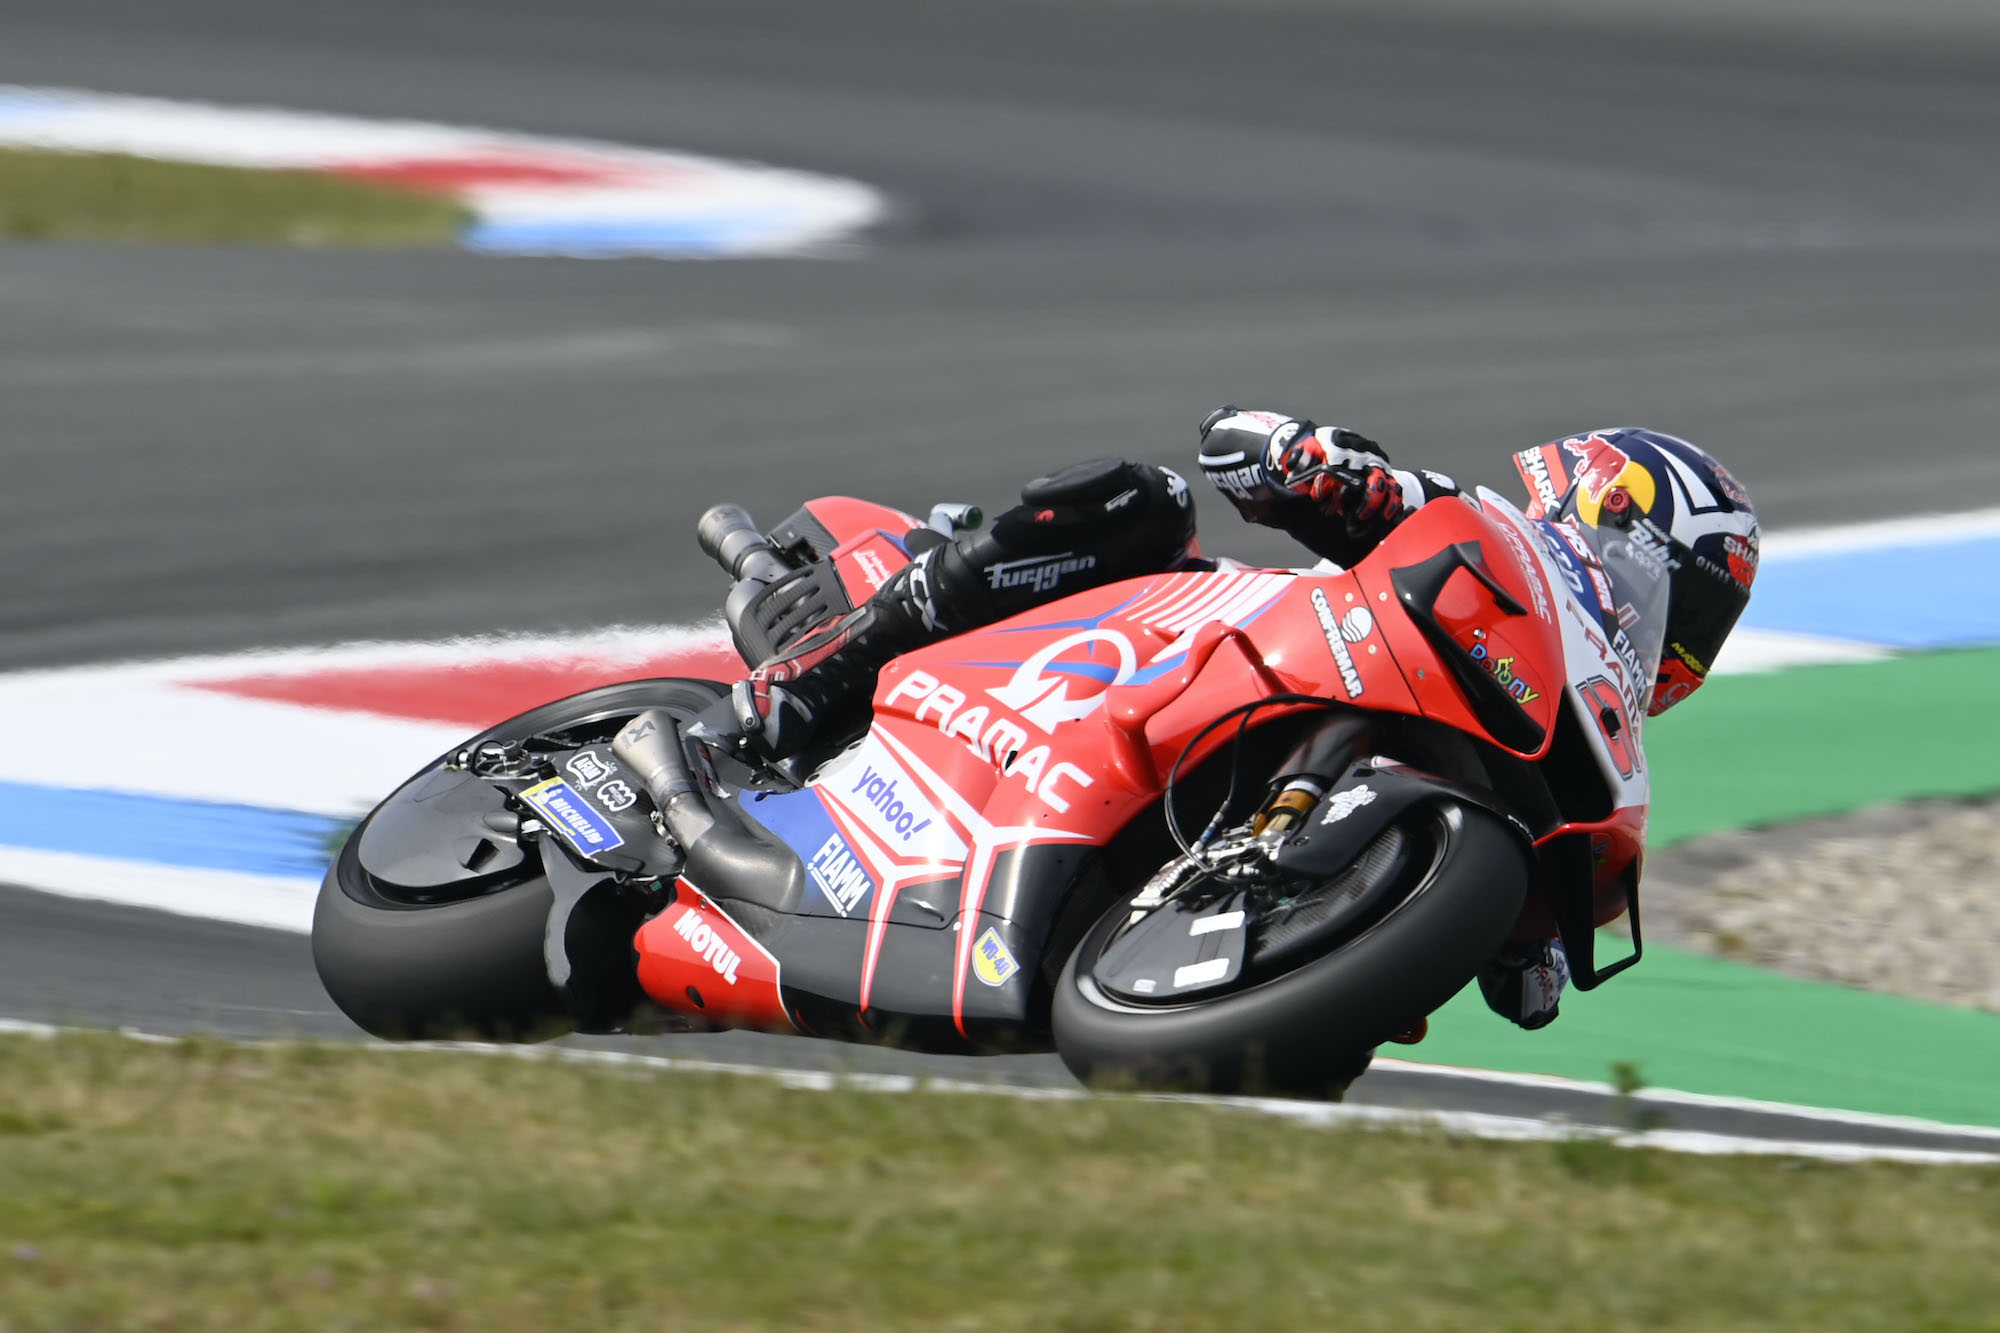 Johann Zarco w akcji podczas rundy MotoGP w Assen